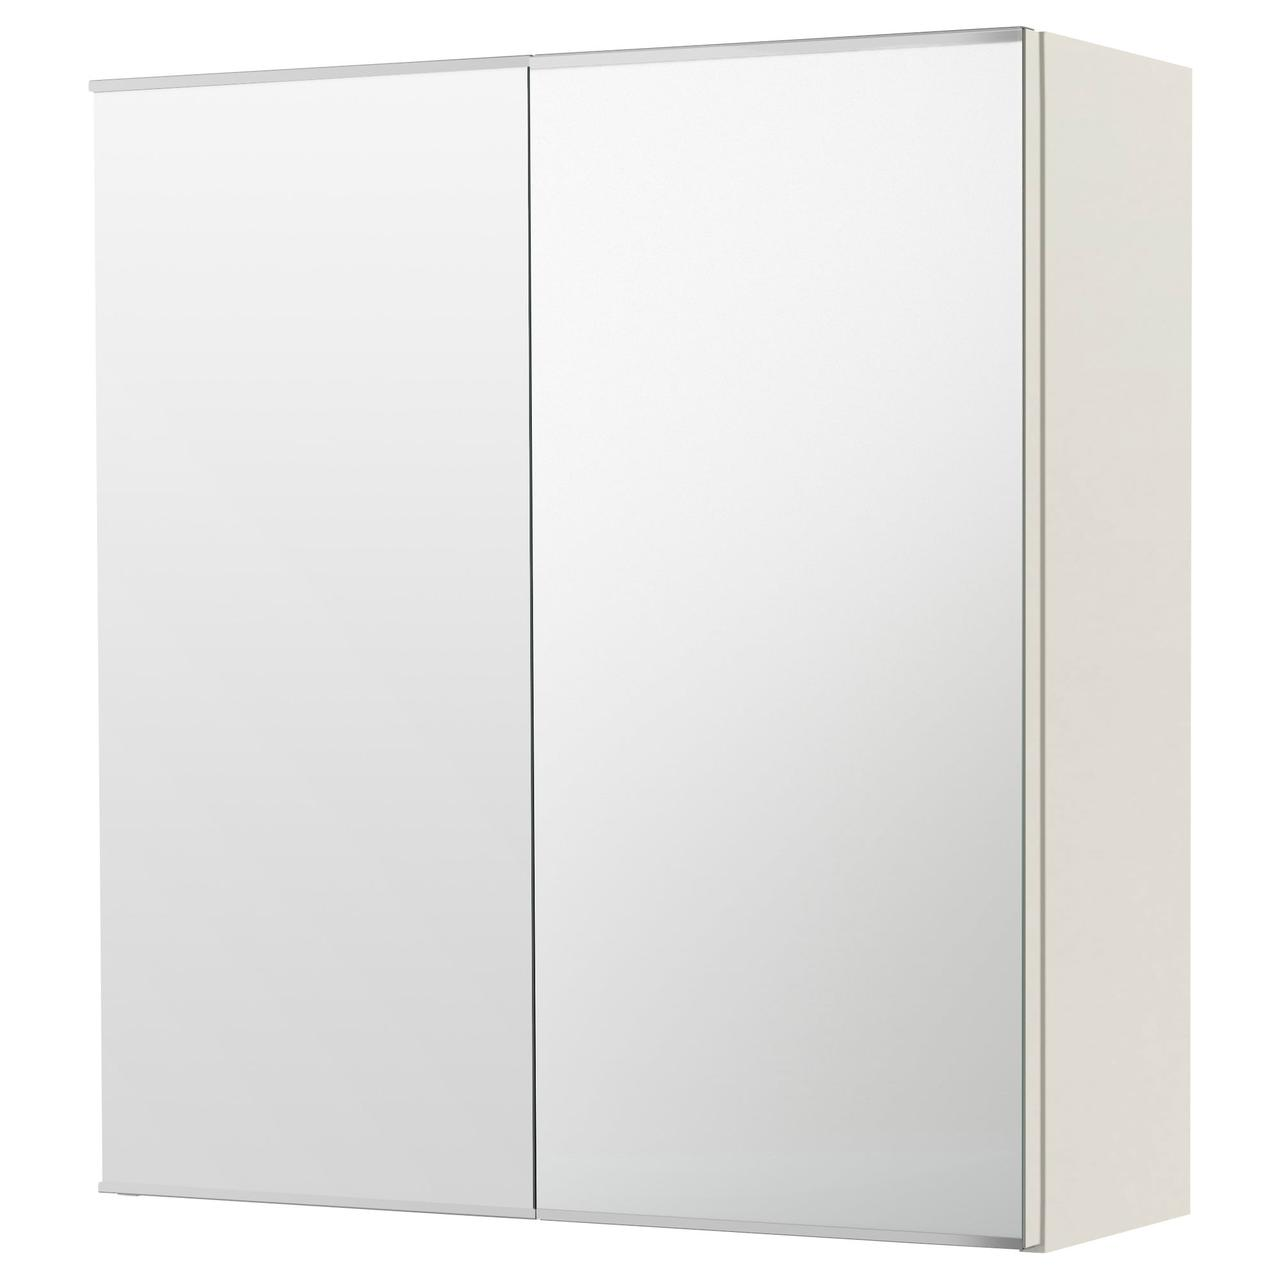 ЛИЛЛОНГЕН Зеркальный шкаф с 2 дверцами, белый